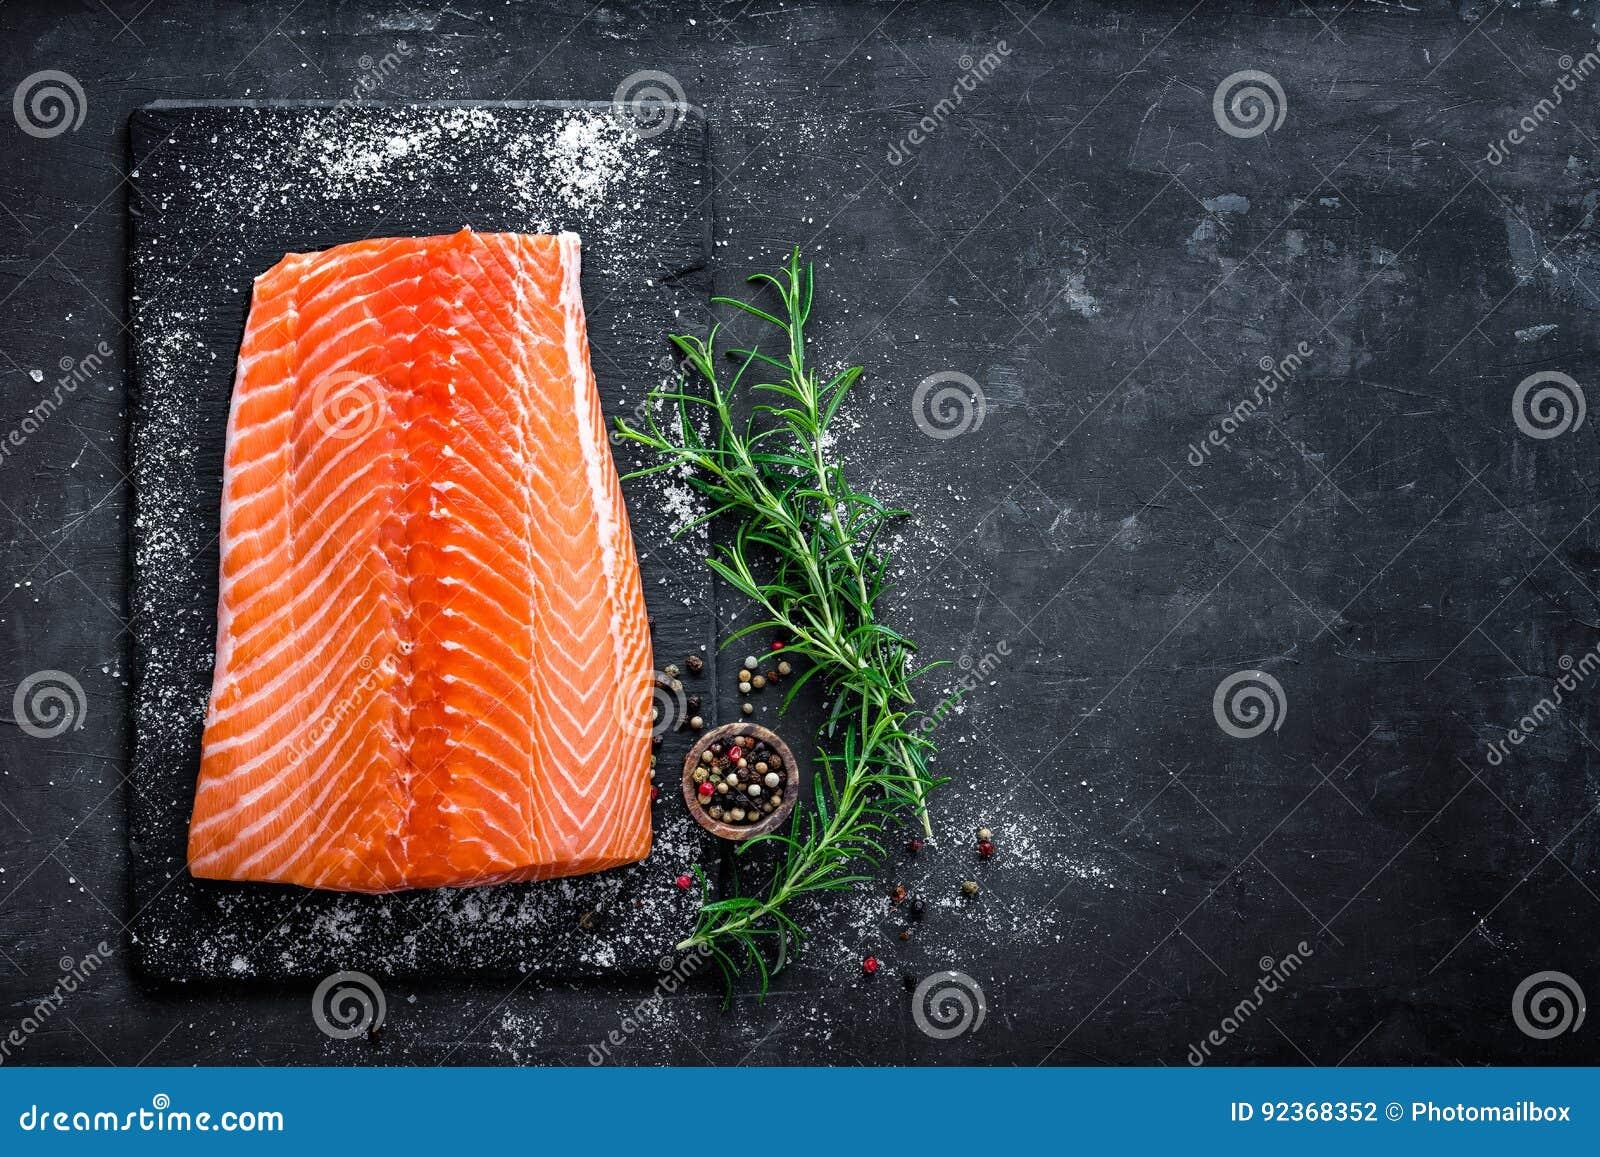 Faixa salmon crua no fundo escuro da ardósia, peixe atlântico selvagem, espaço para o texto